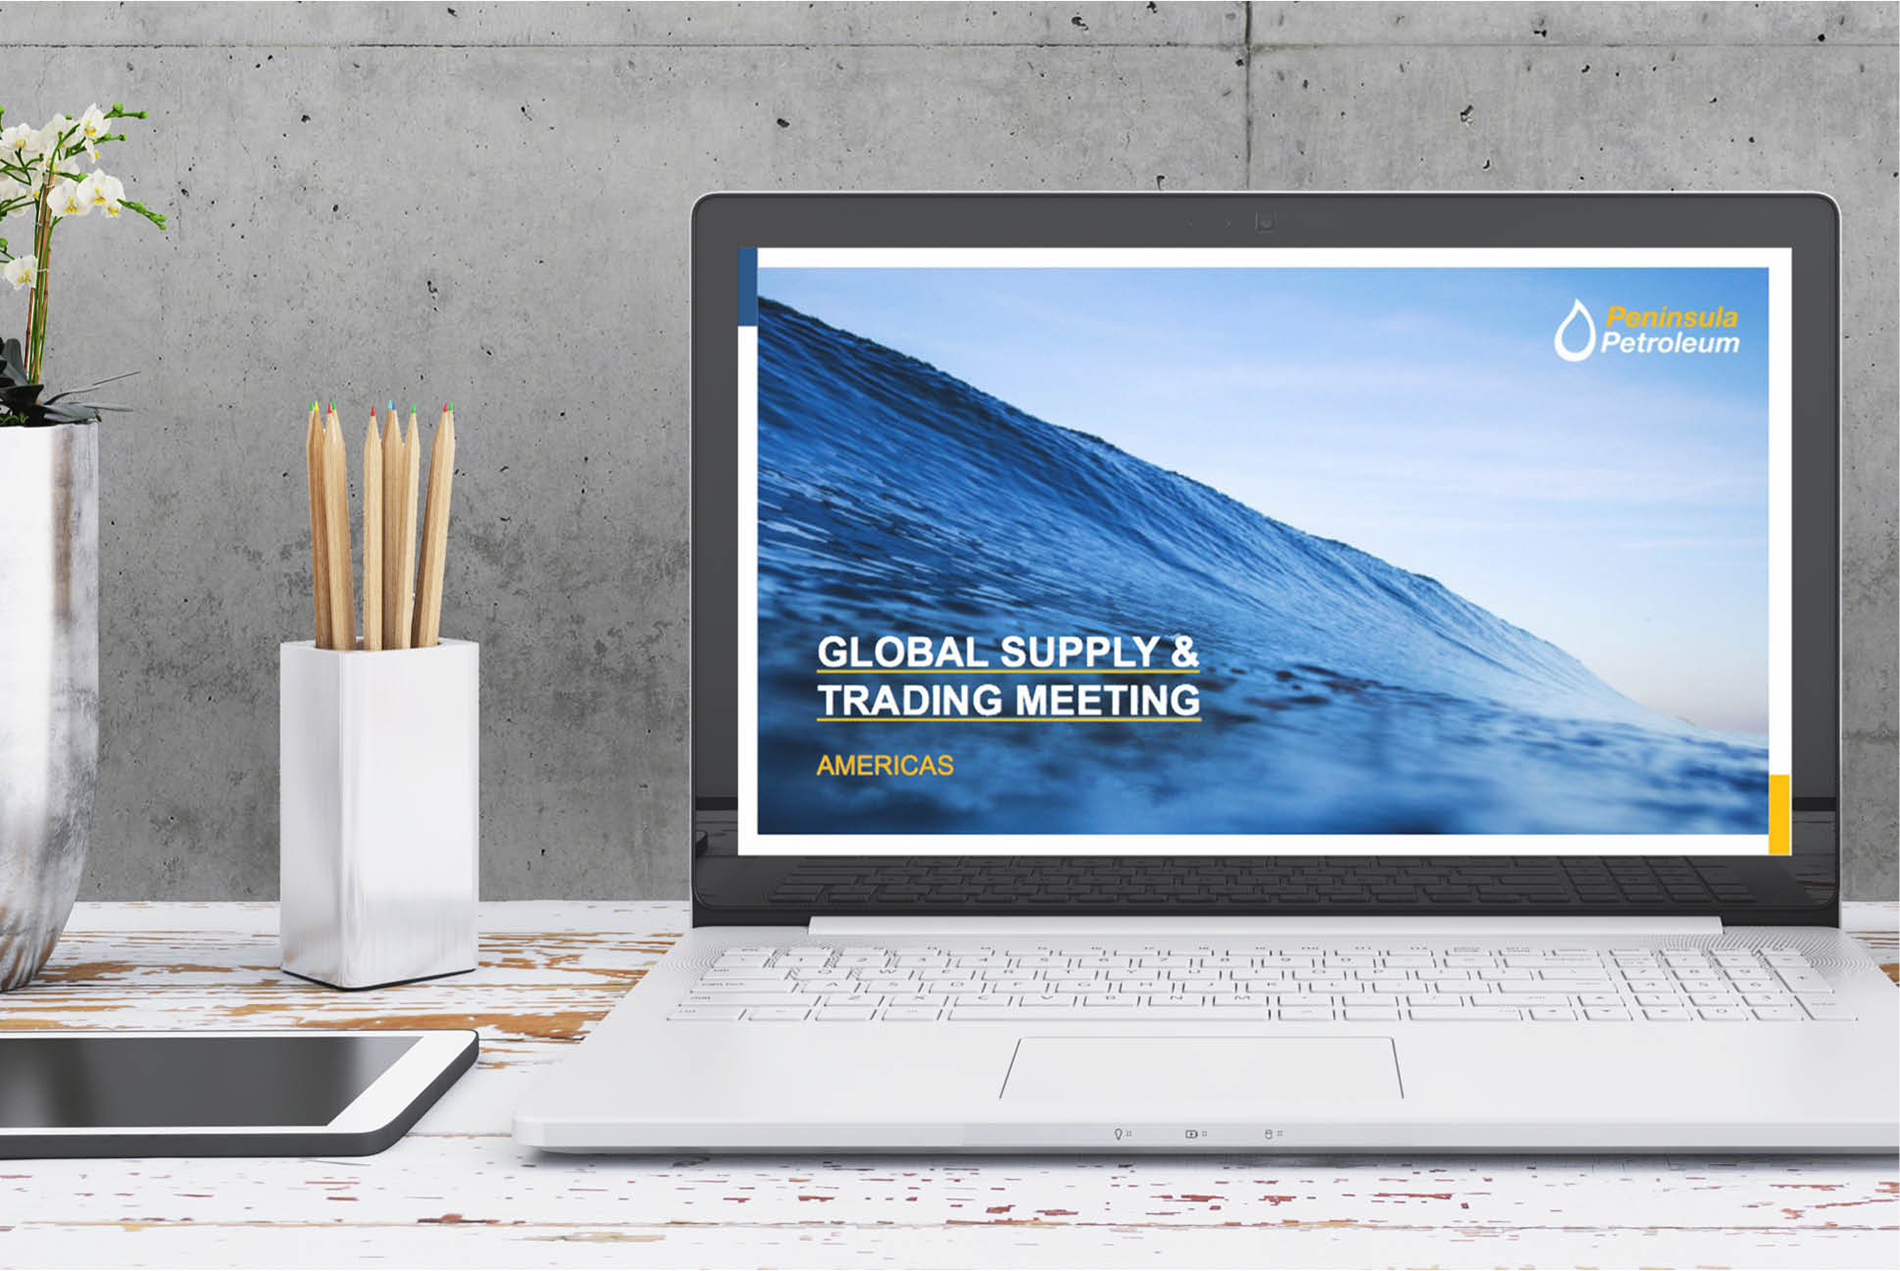 Peninsula Petroleum presentation | Branding and Marketing Services - Independent Marketing | IM London